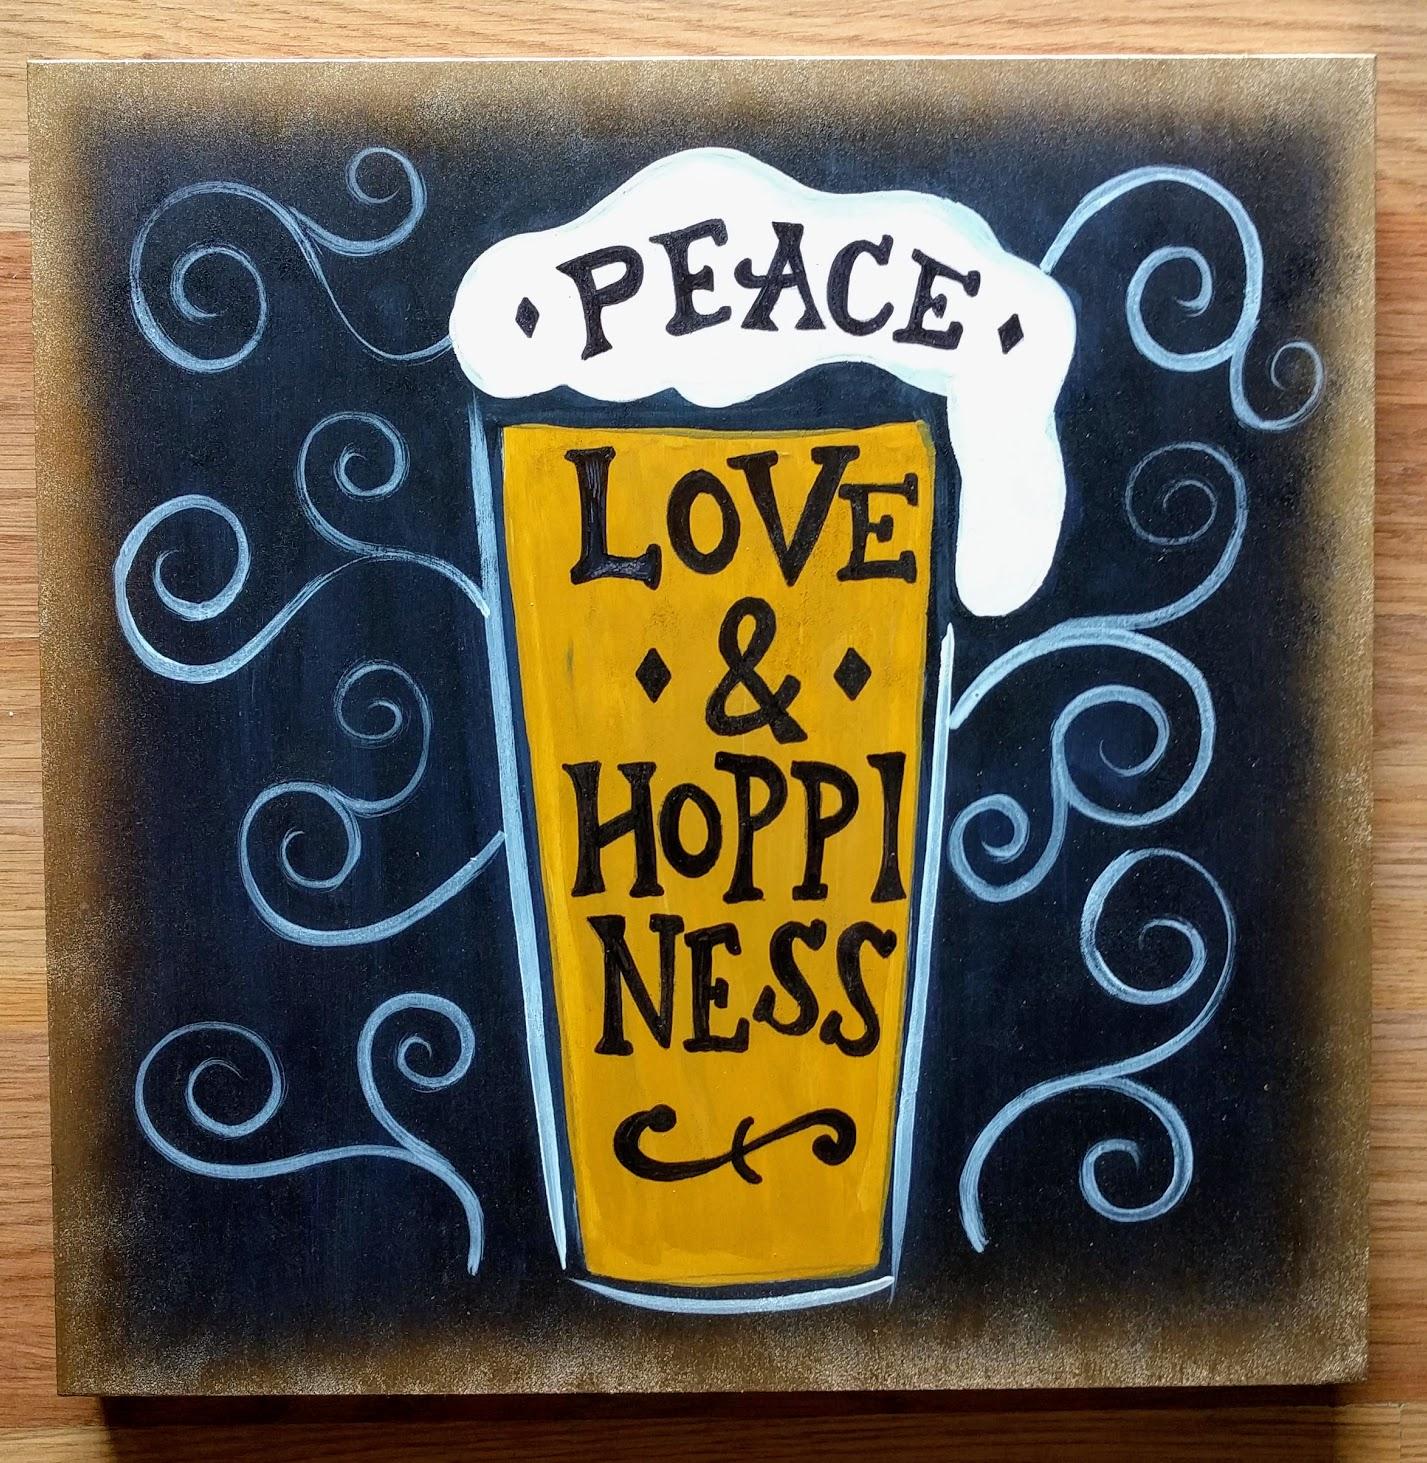 Peace, Love & Hoppiness